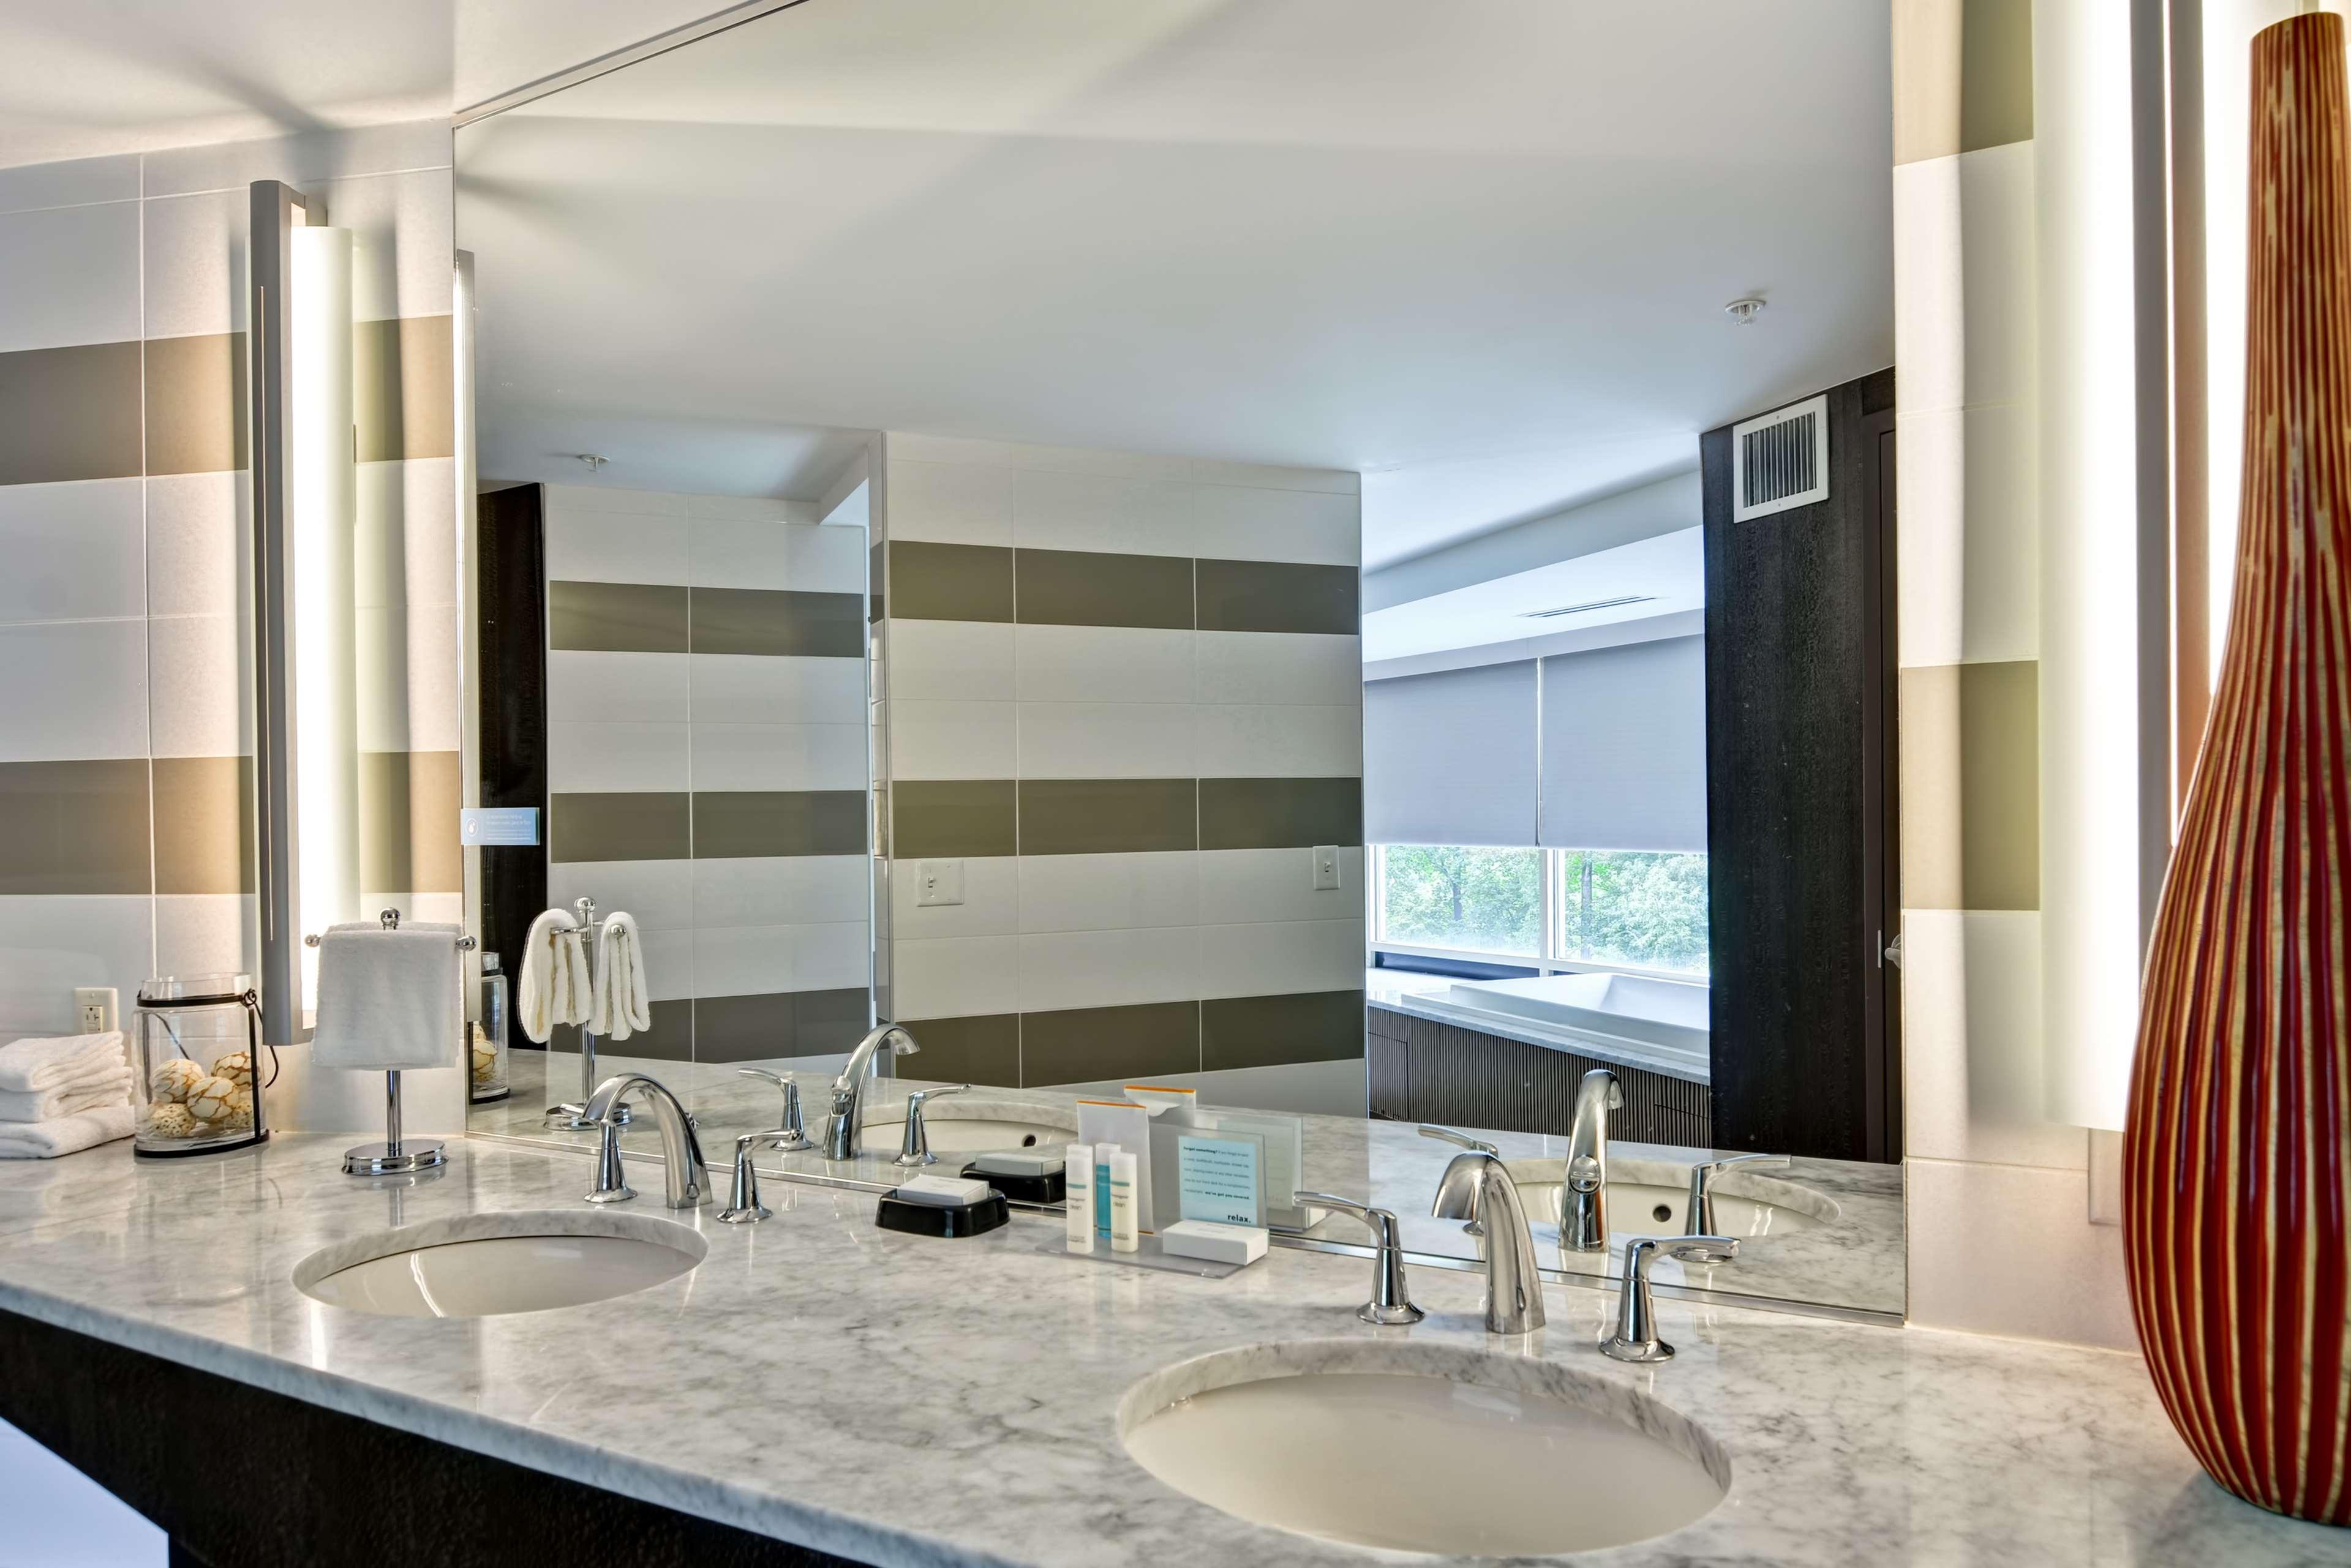 Hampton Inn & Suites Raleigh/Crabtree Valley image 26